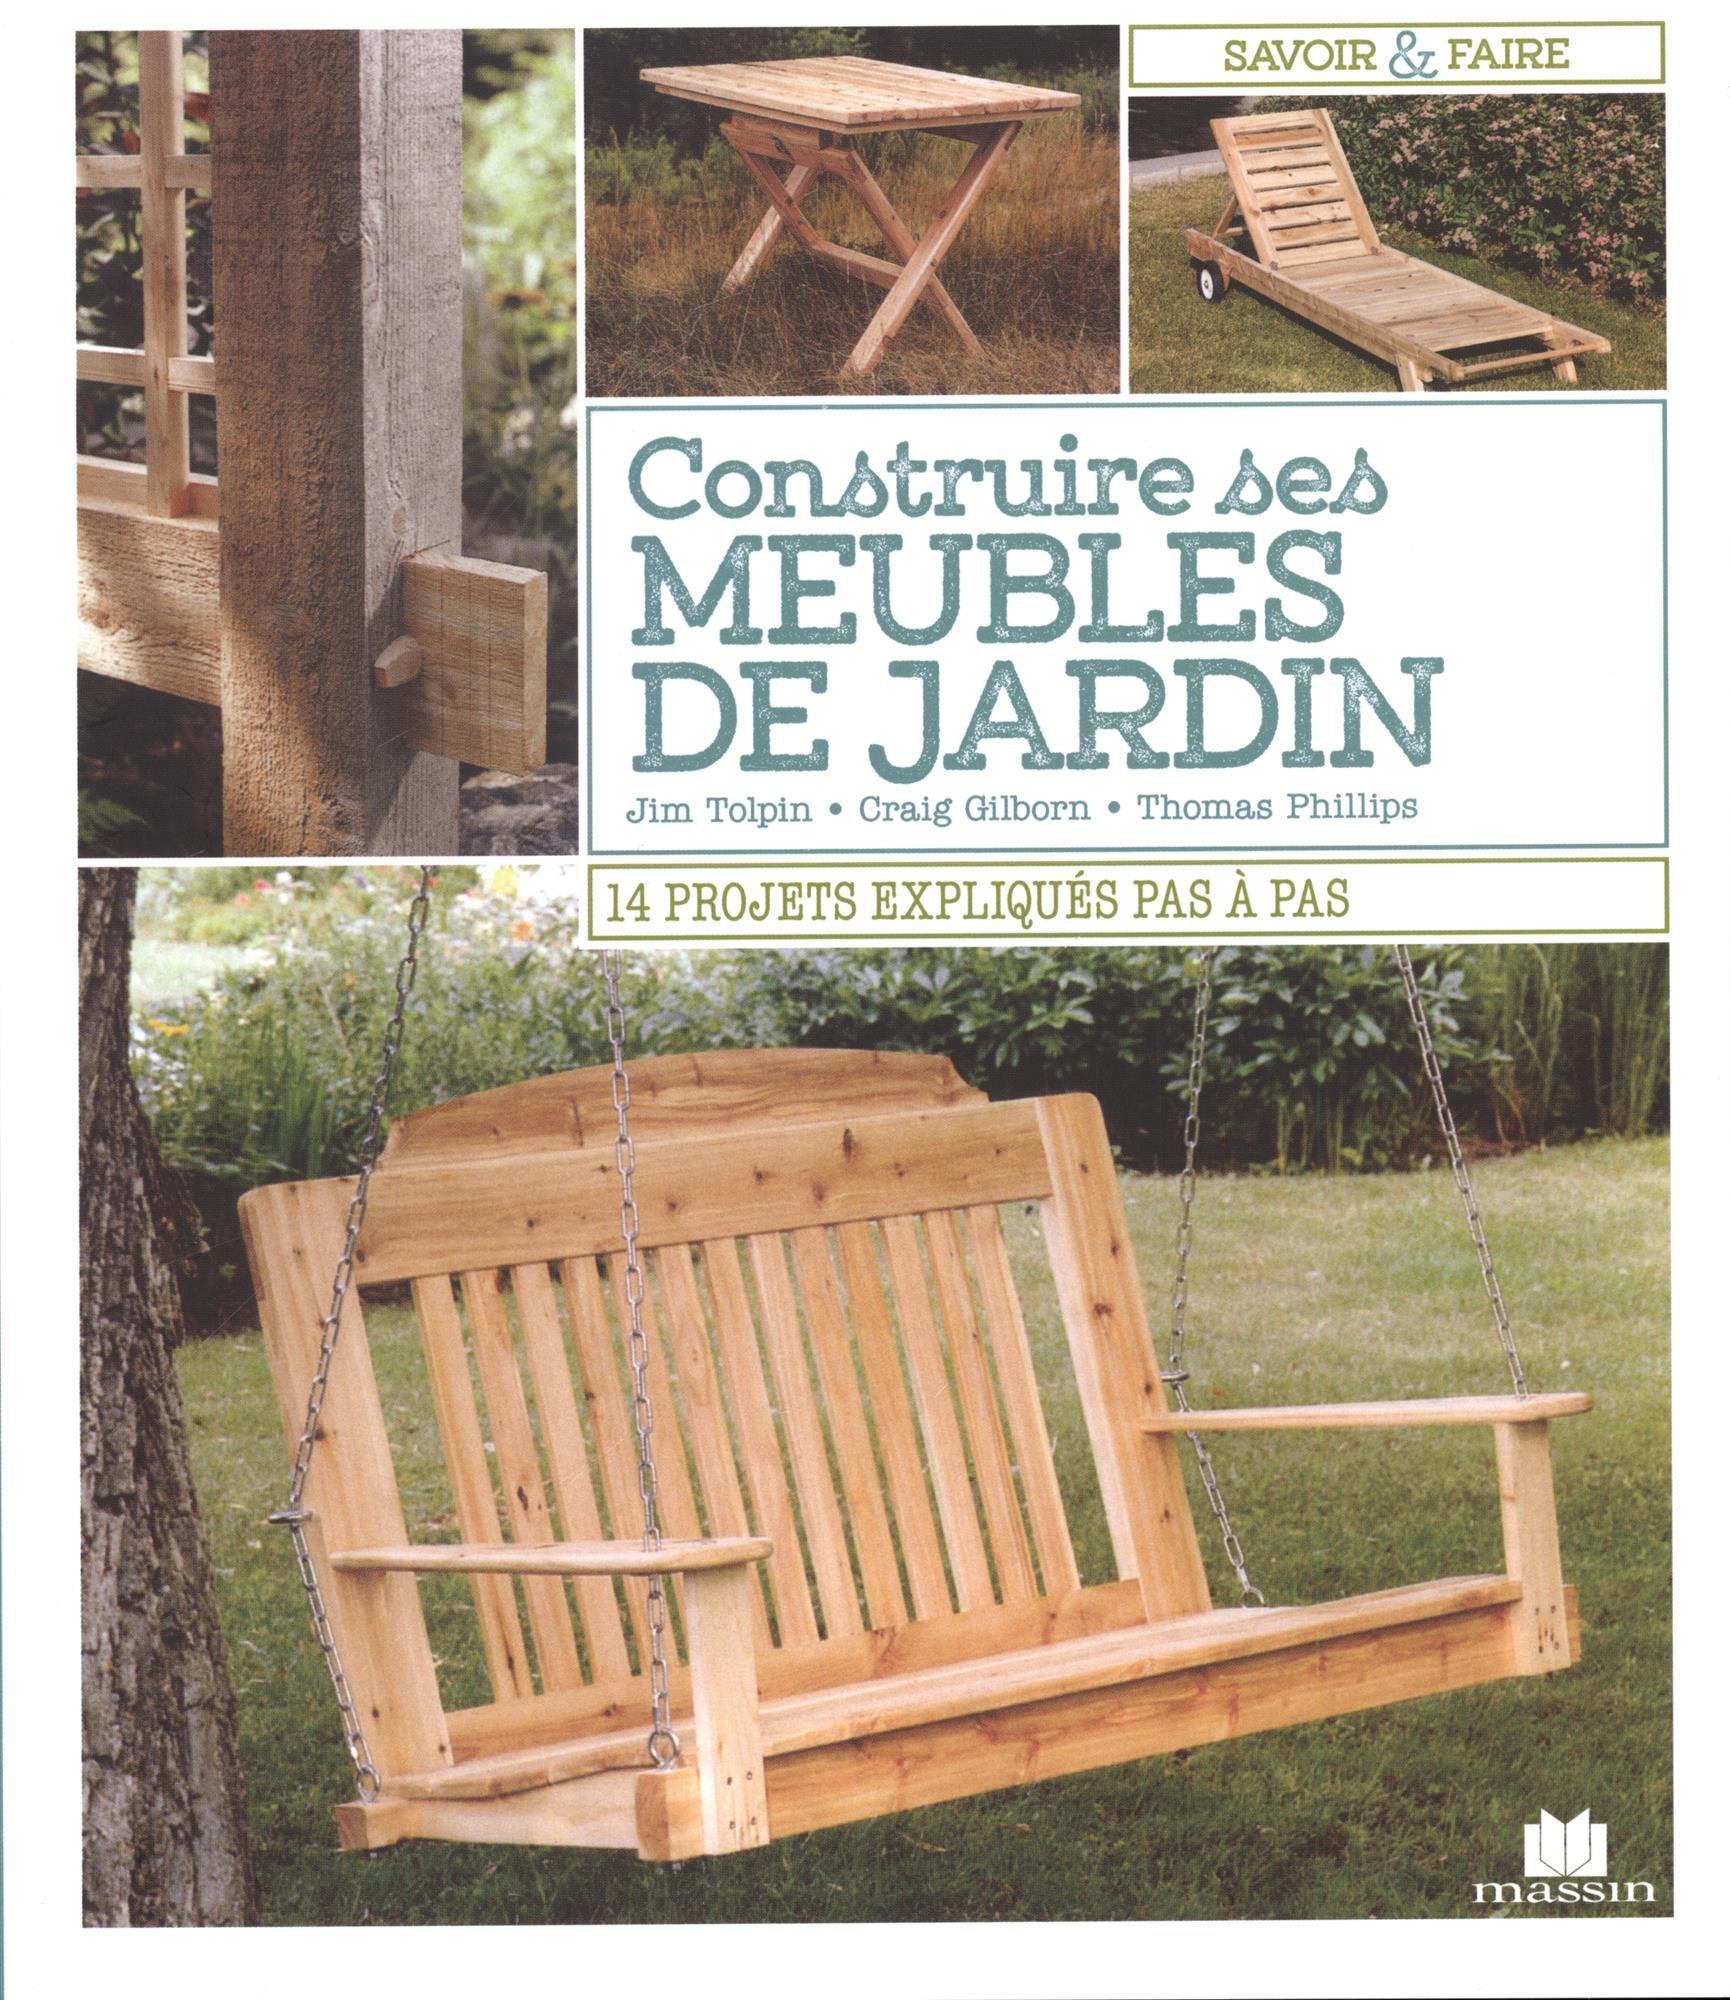 Construire ses meubles de jardin (Savoir & faire): Amazon.es: Tolpin, Jim, Gilborn, Craig, Phillips, Thomas, Borie, Paul: Libros en idiomas extranjeros